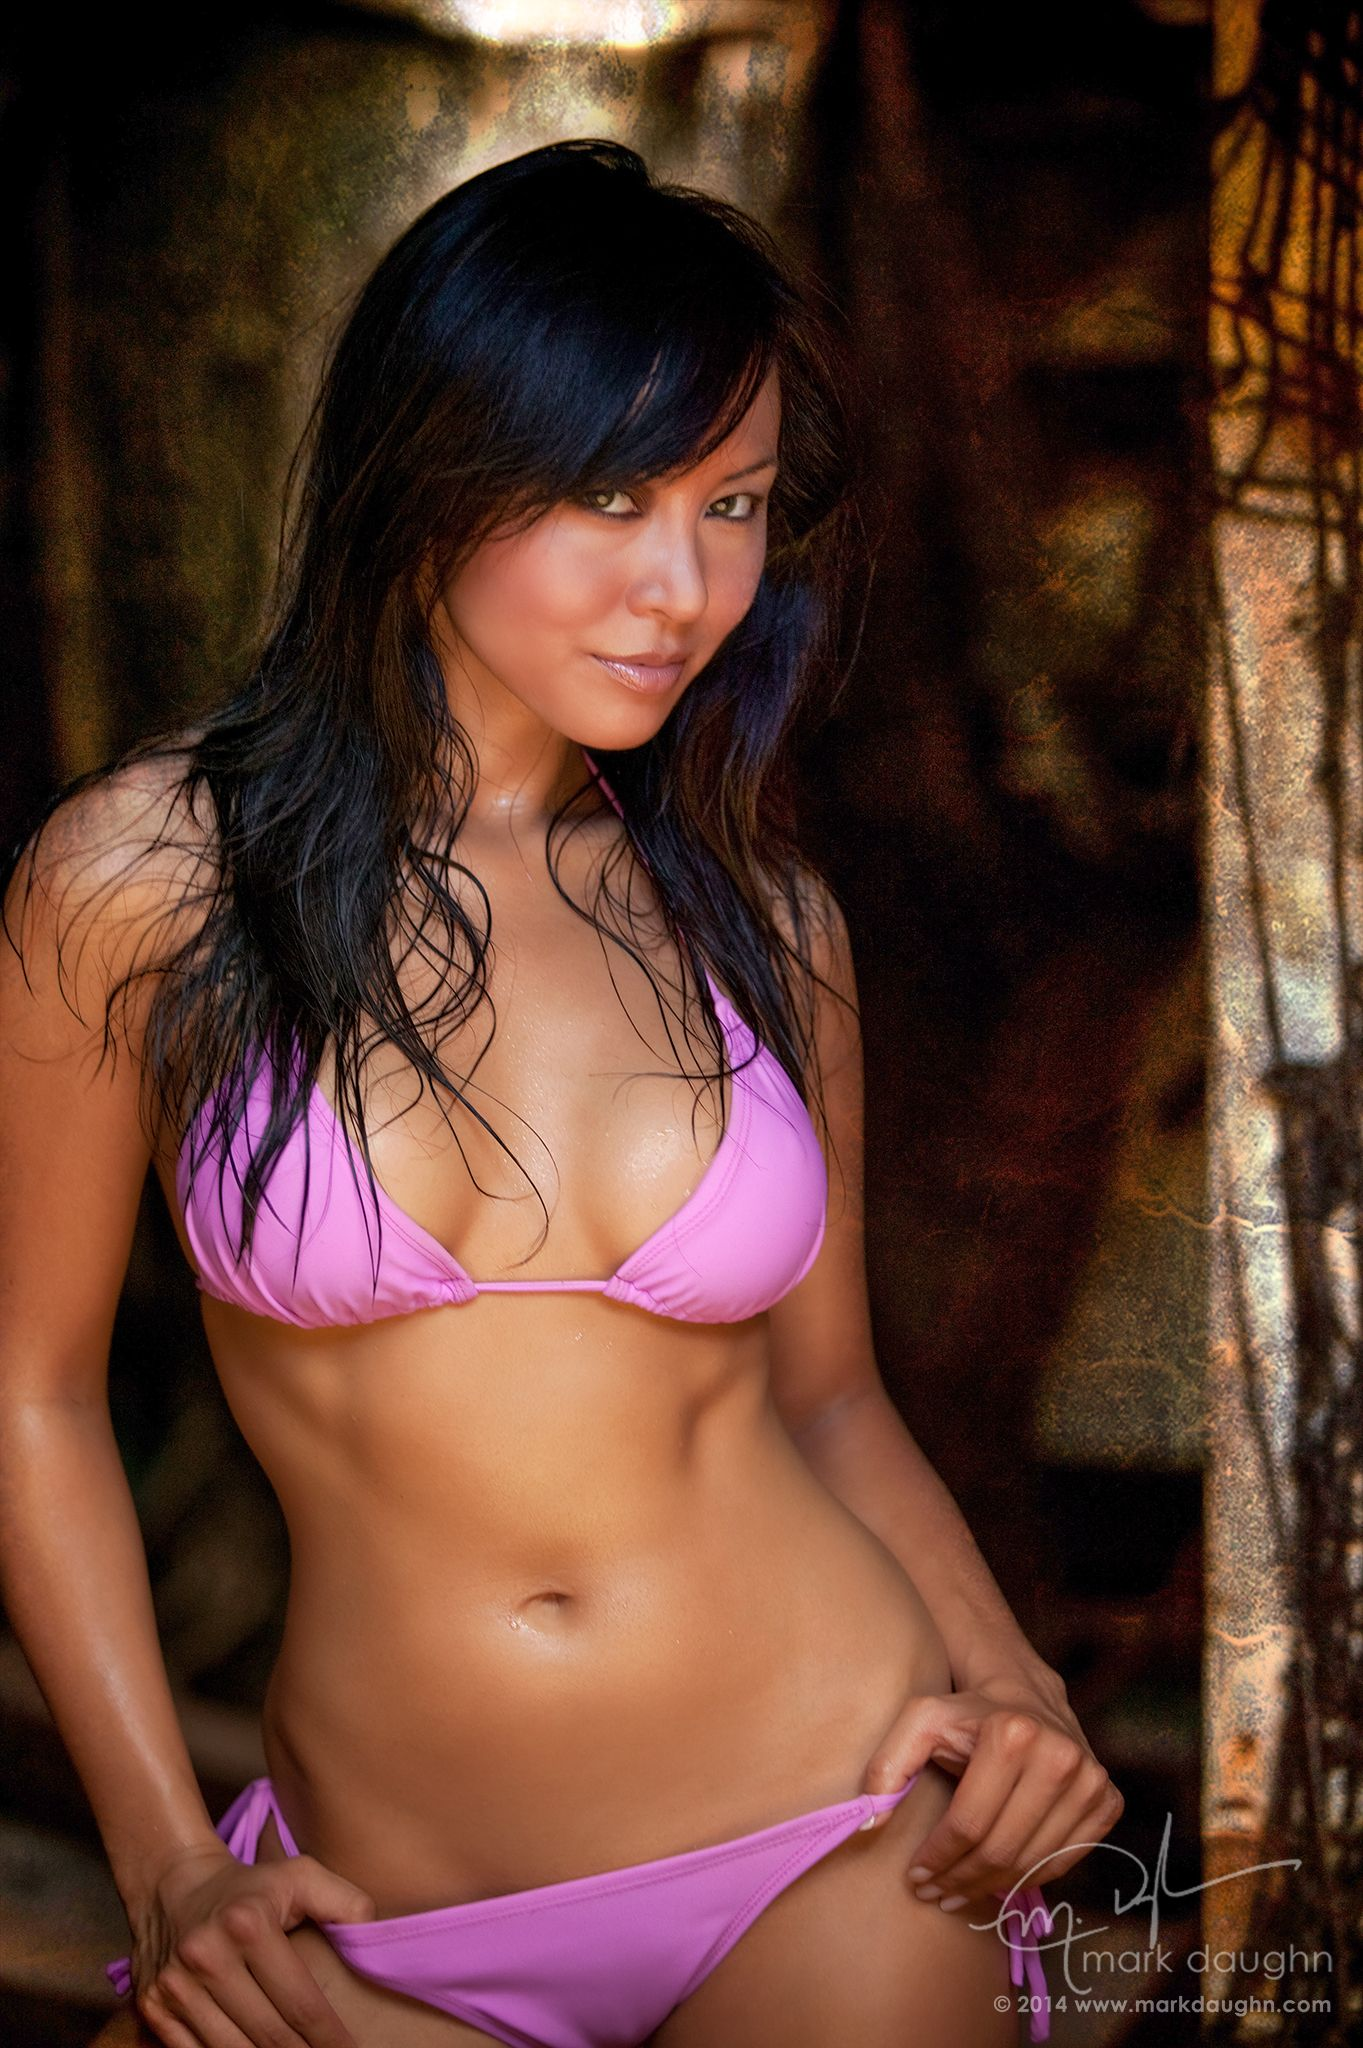 Christine nguyen bikini girls